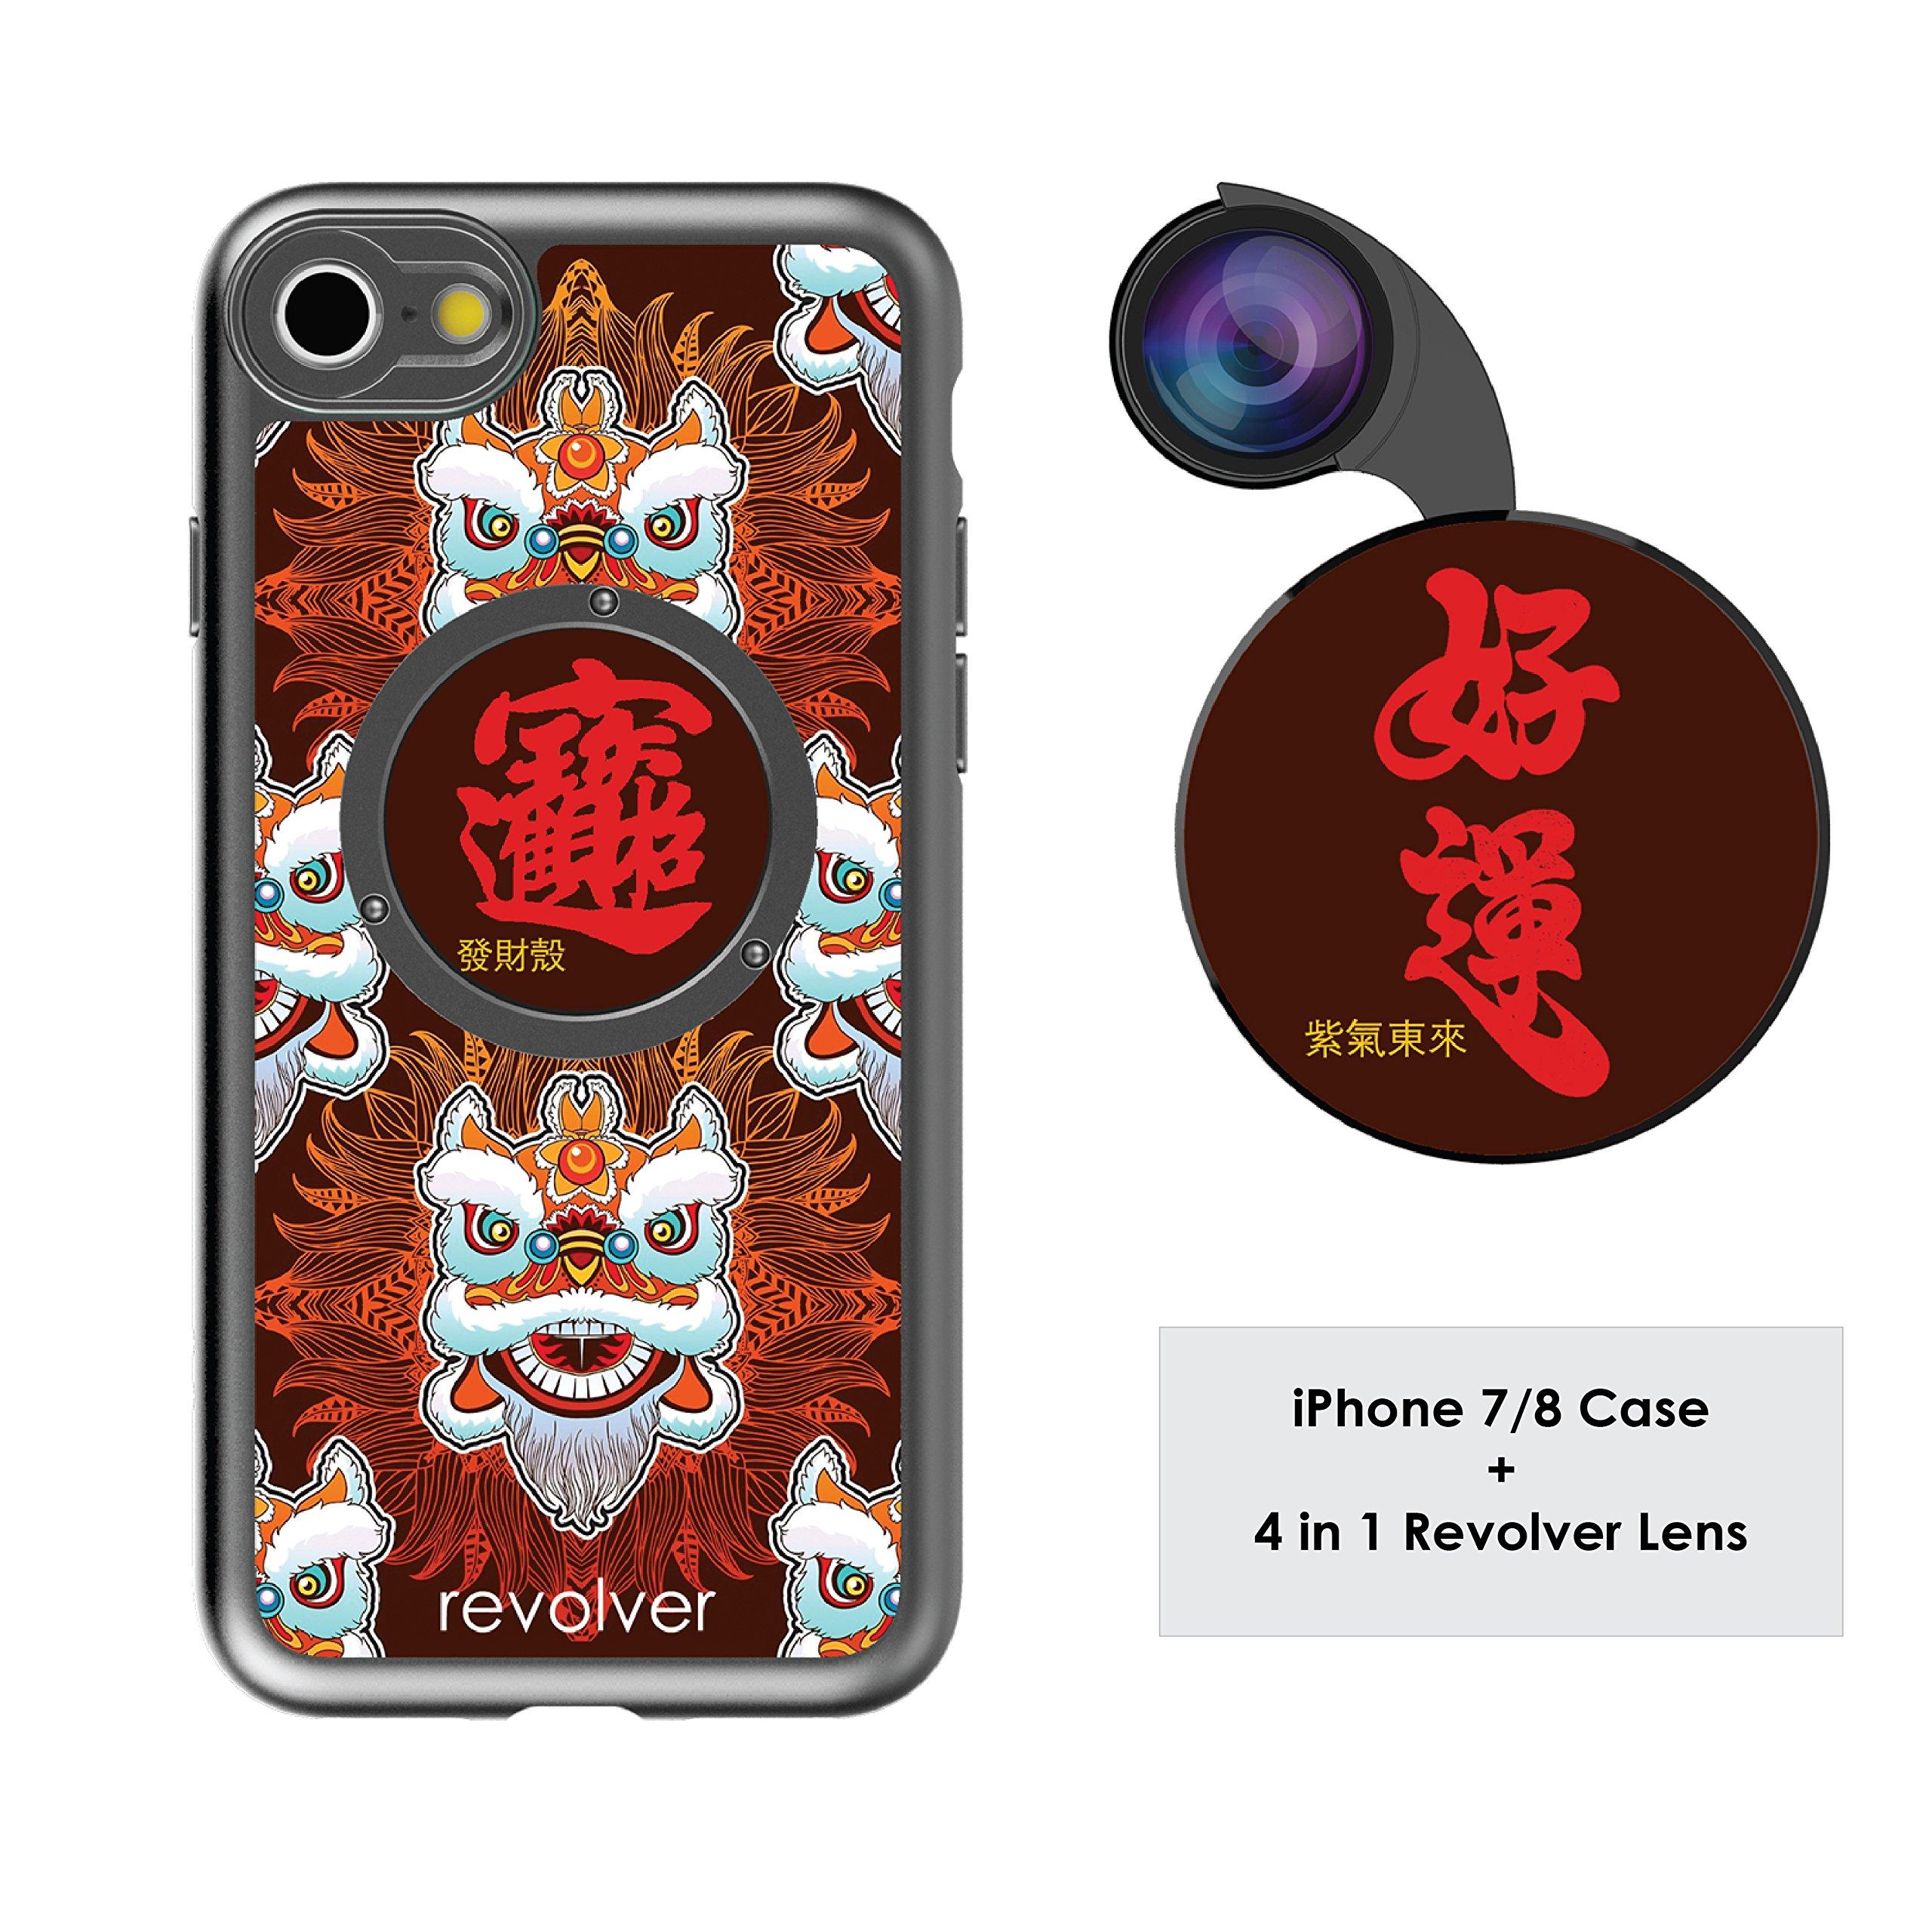 Funda y 4  Lentes Ztylus Revolver p/ iPhone 7/8 - Dark Re...